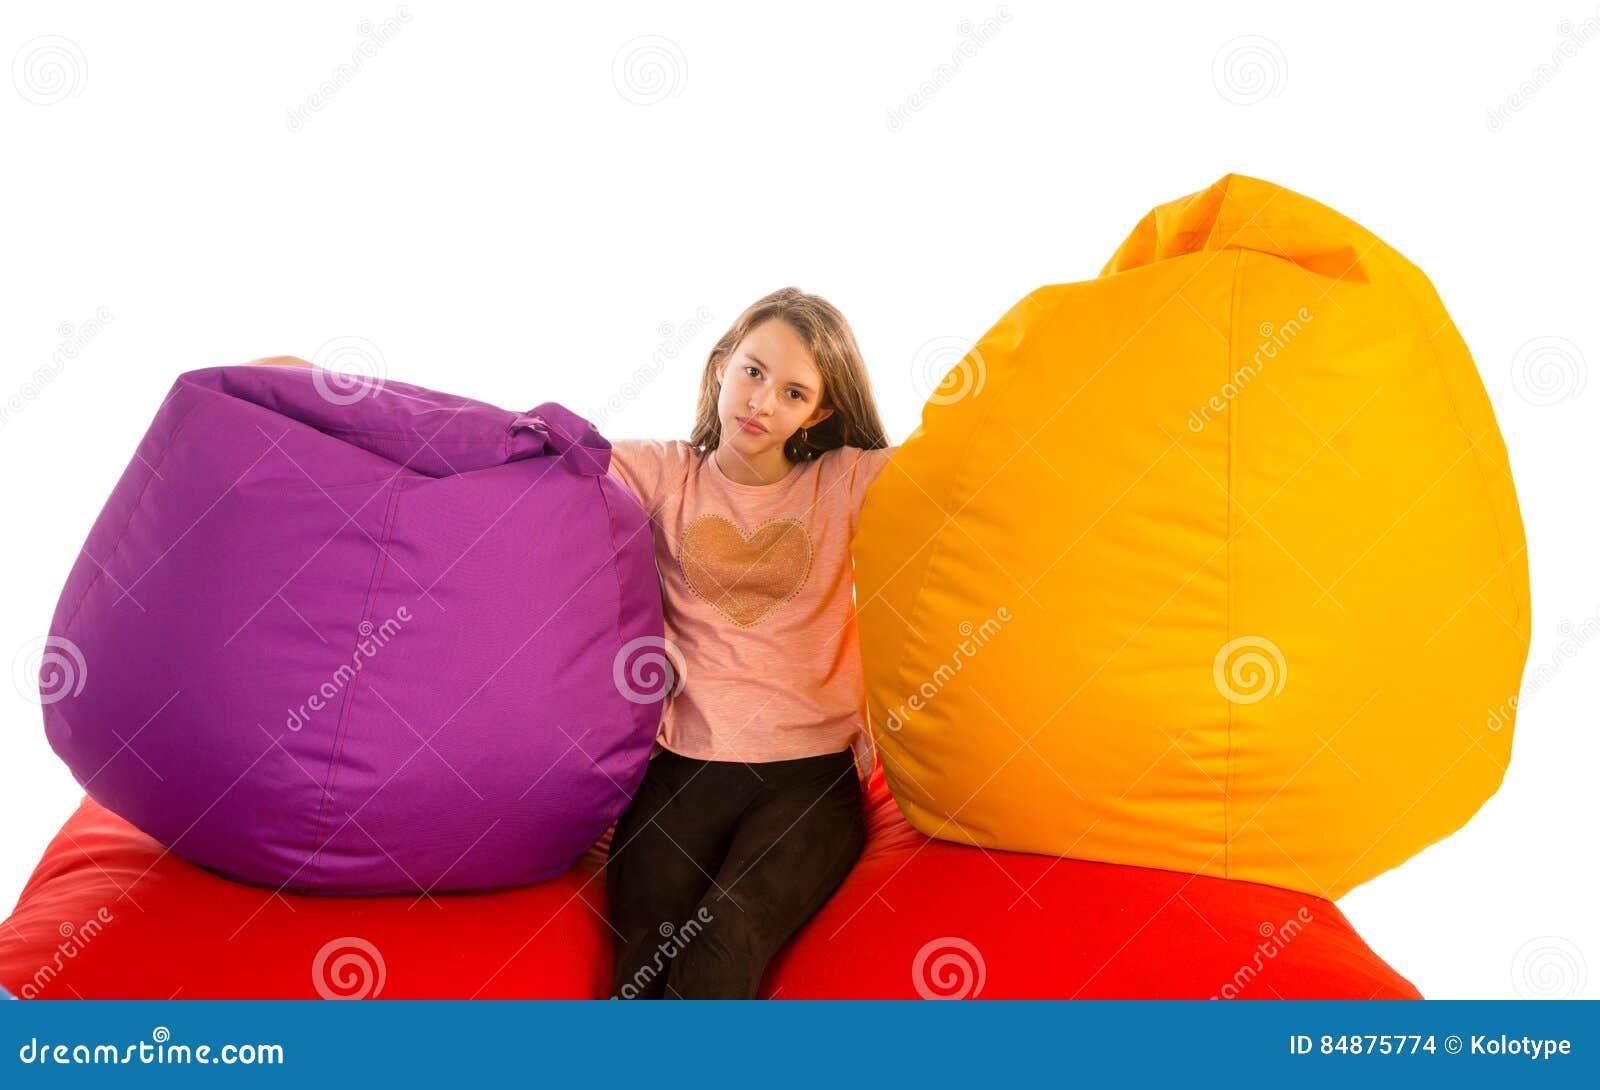 Girl Sitting Between Beanbag Chairs On Red Beanbag Sofa